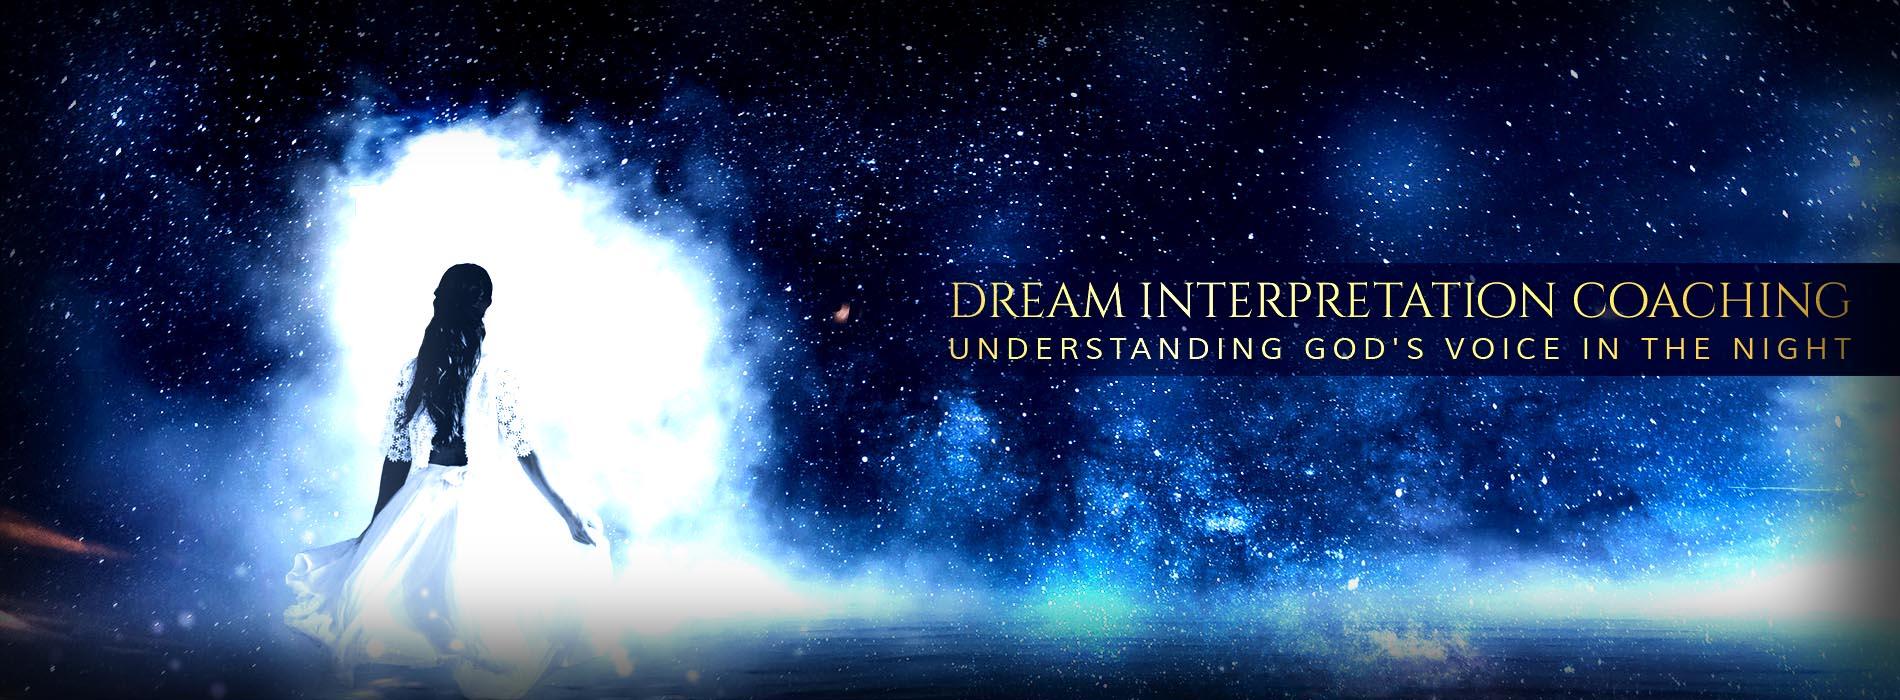 christian-dream-interpretation-coaching-teaching-pg